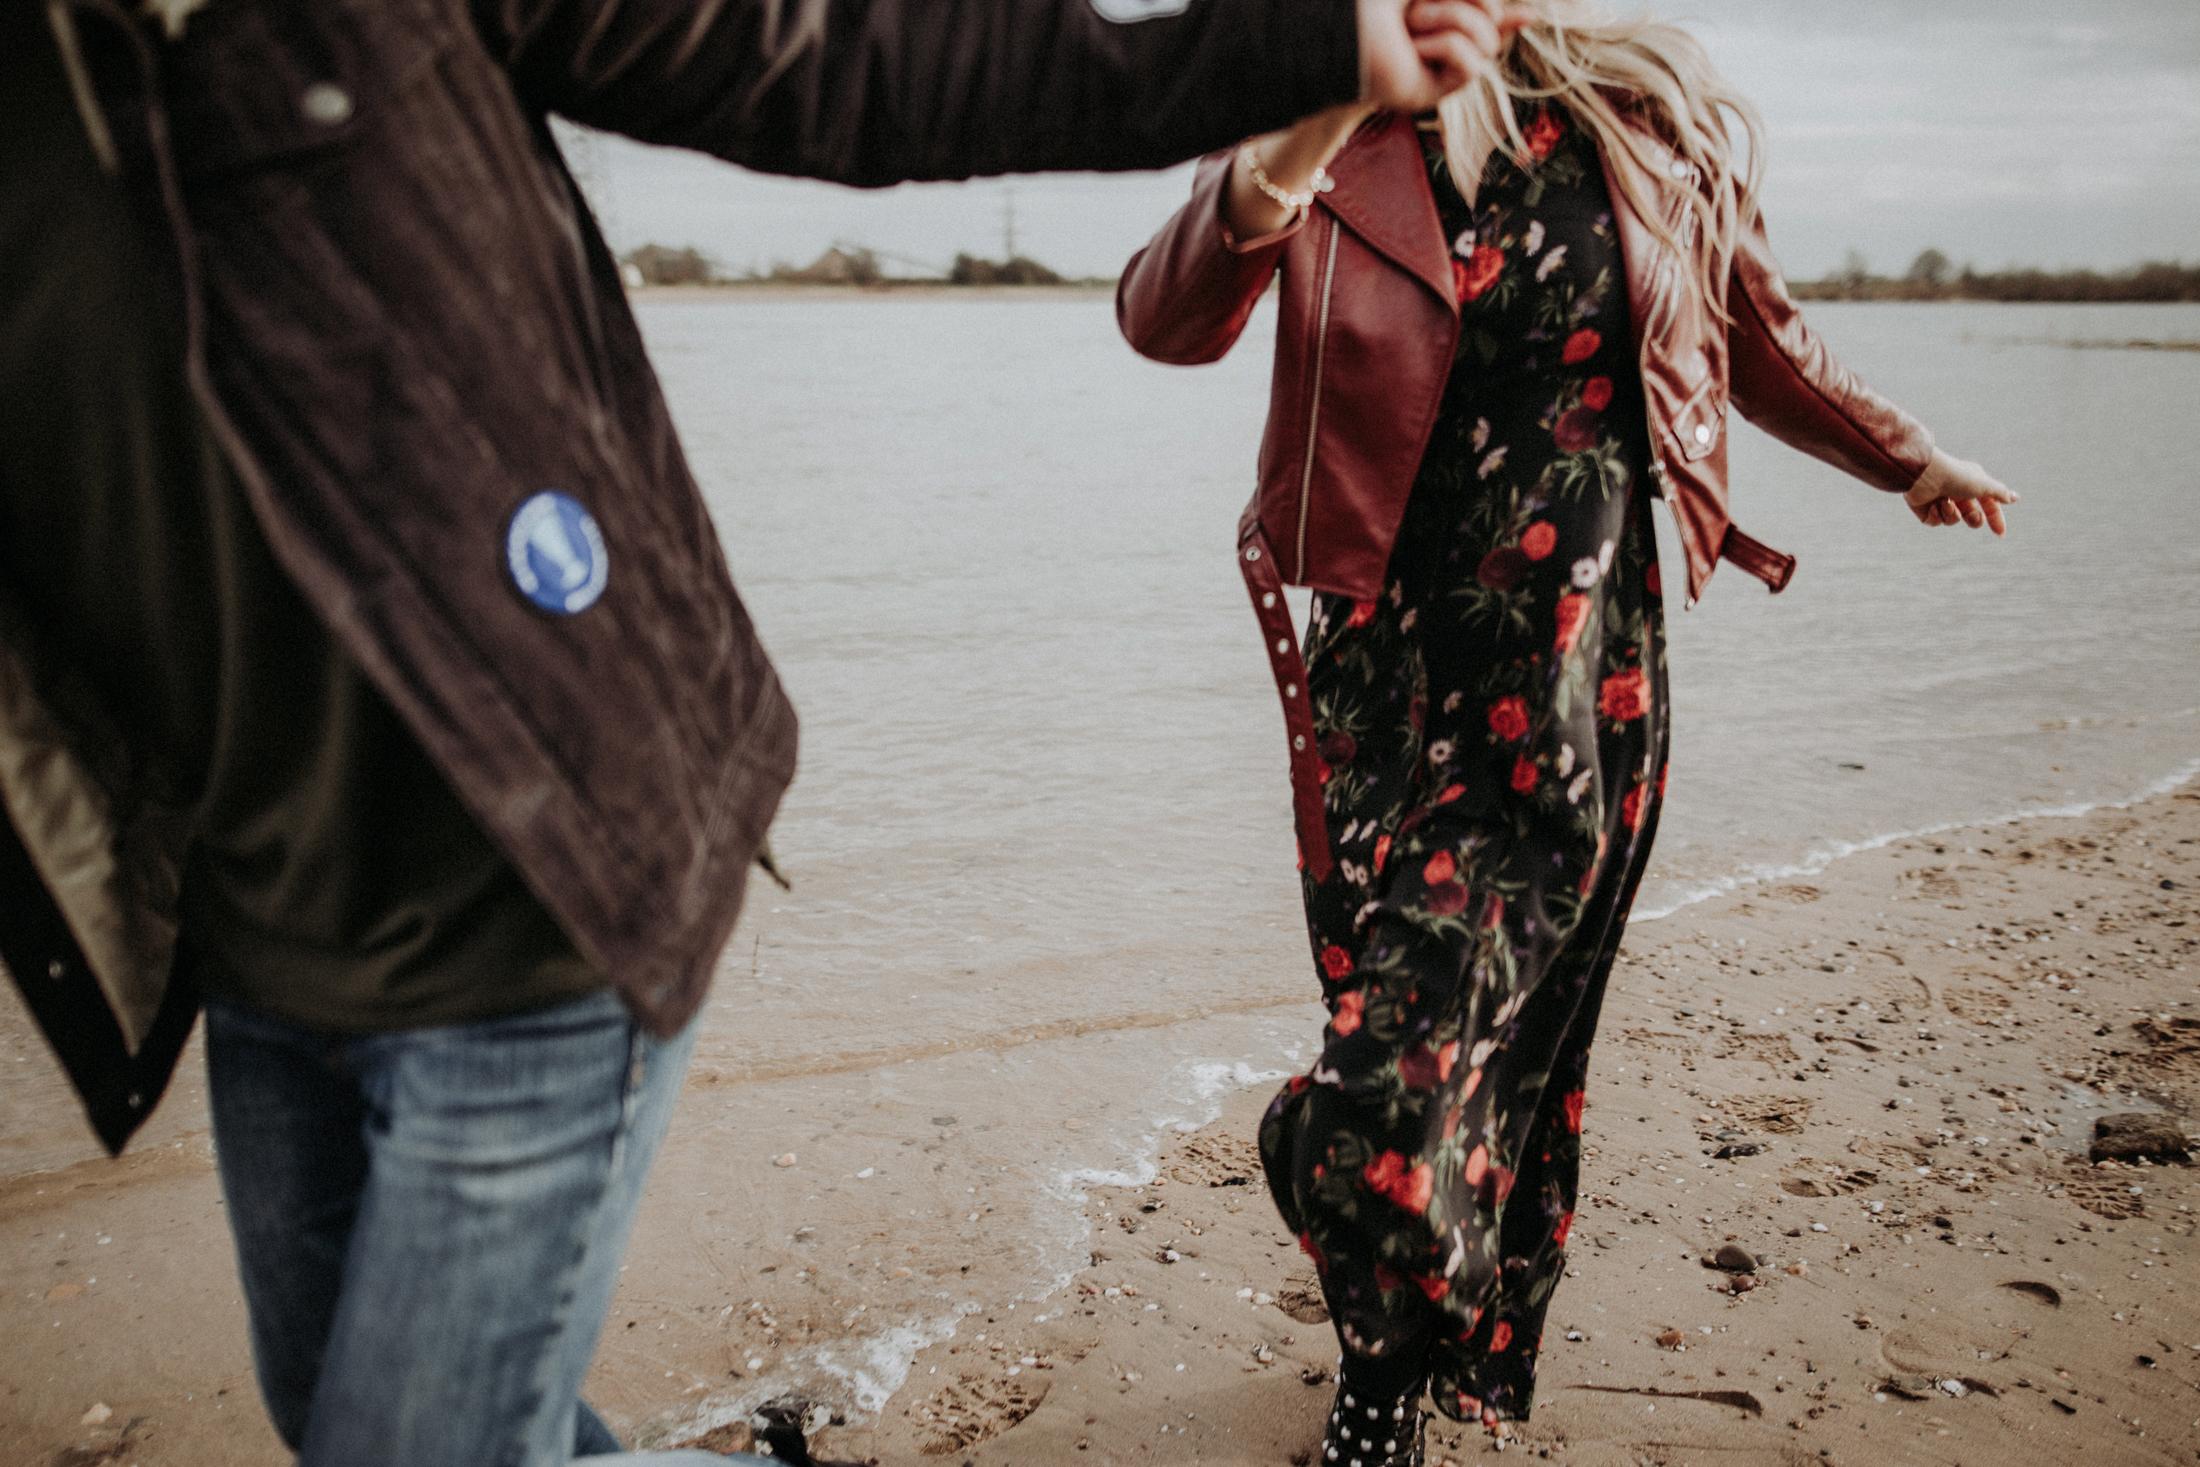 Wedding_Photographer_Mallorca_DanielaMarquardt_Photography_CanaryIslands_Lanzarote_Iceland_Tuscany_Santorini_Portugal_NewYork_Spain_Elopement_Hochzeitsfotograf_CK18